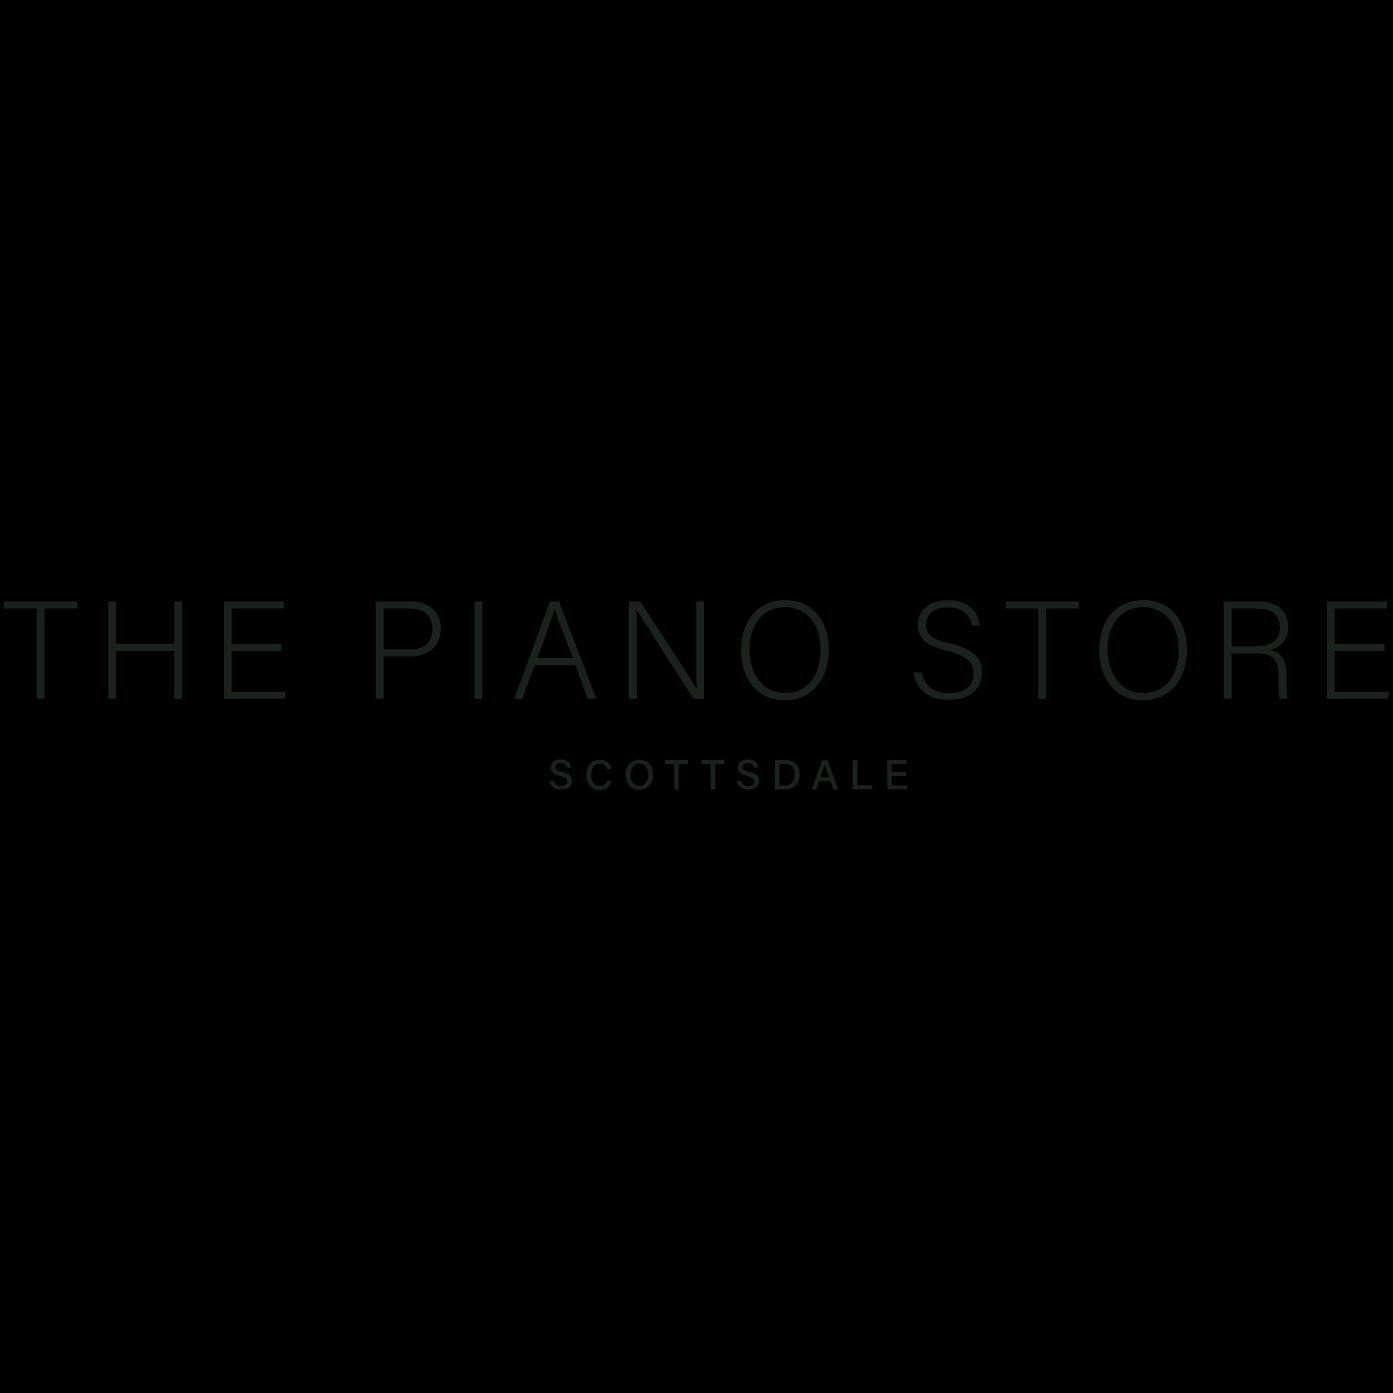 The Piano Store Scottsdale